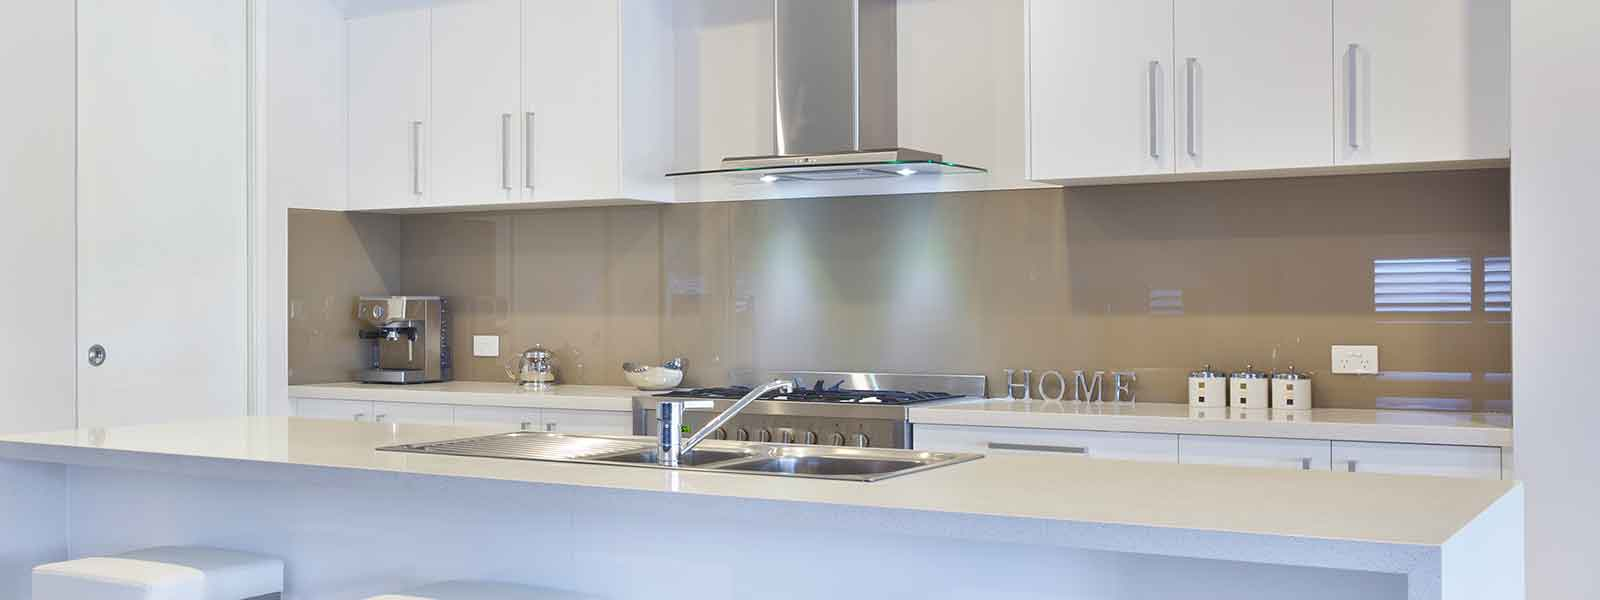 BWD_22939676_kitchentest